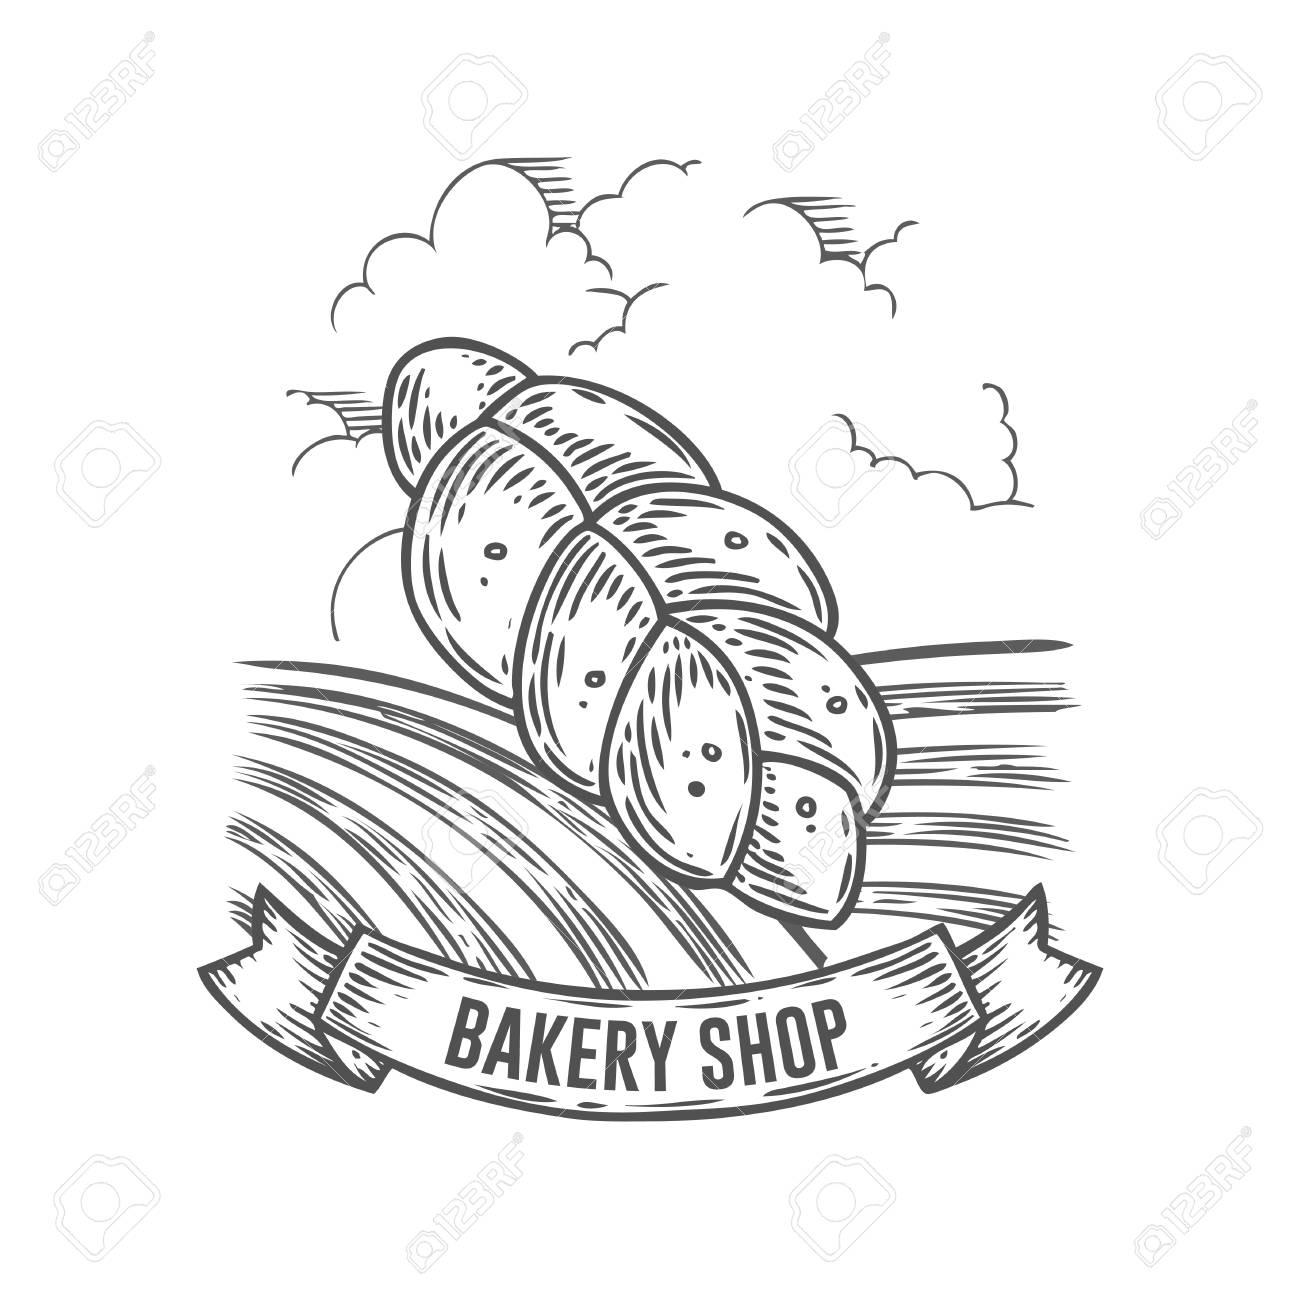 1300x1300 Bakery Shop Bread Badge. Monochrome Vintage Engraved Bun, Gluten